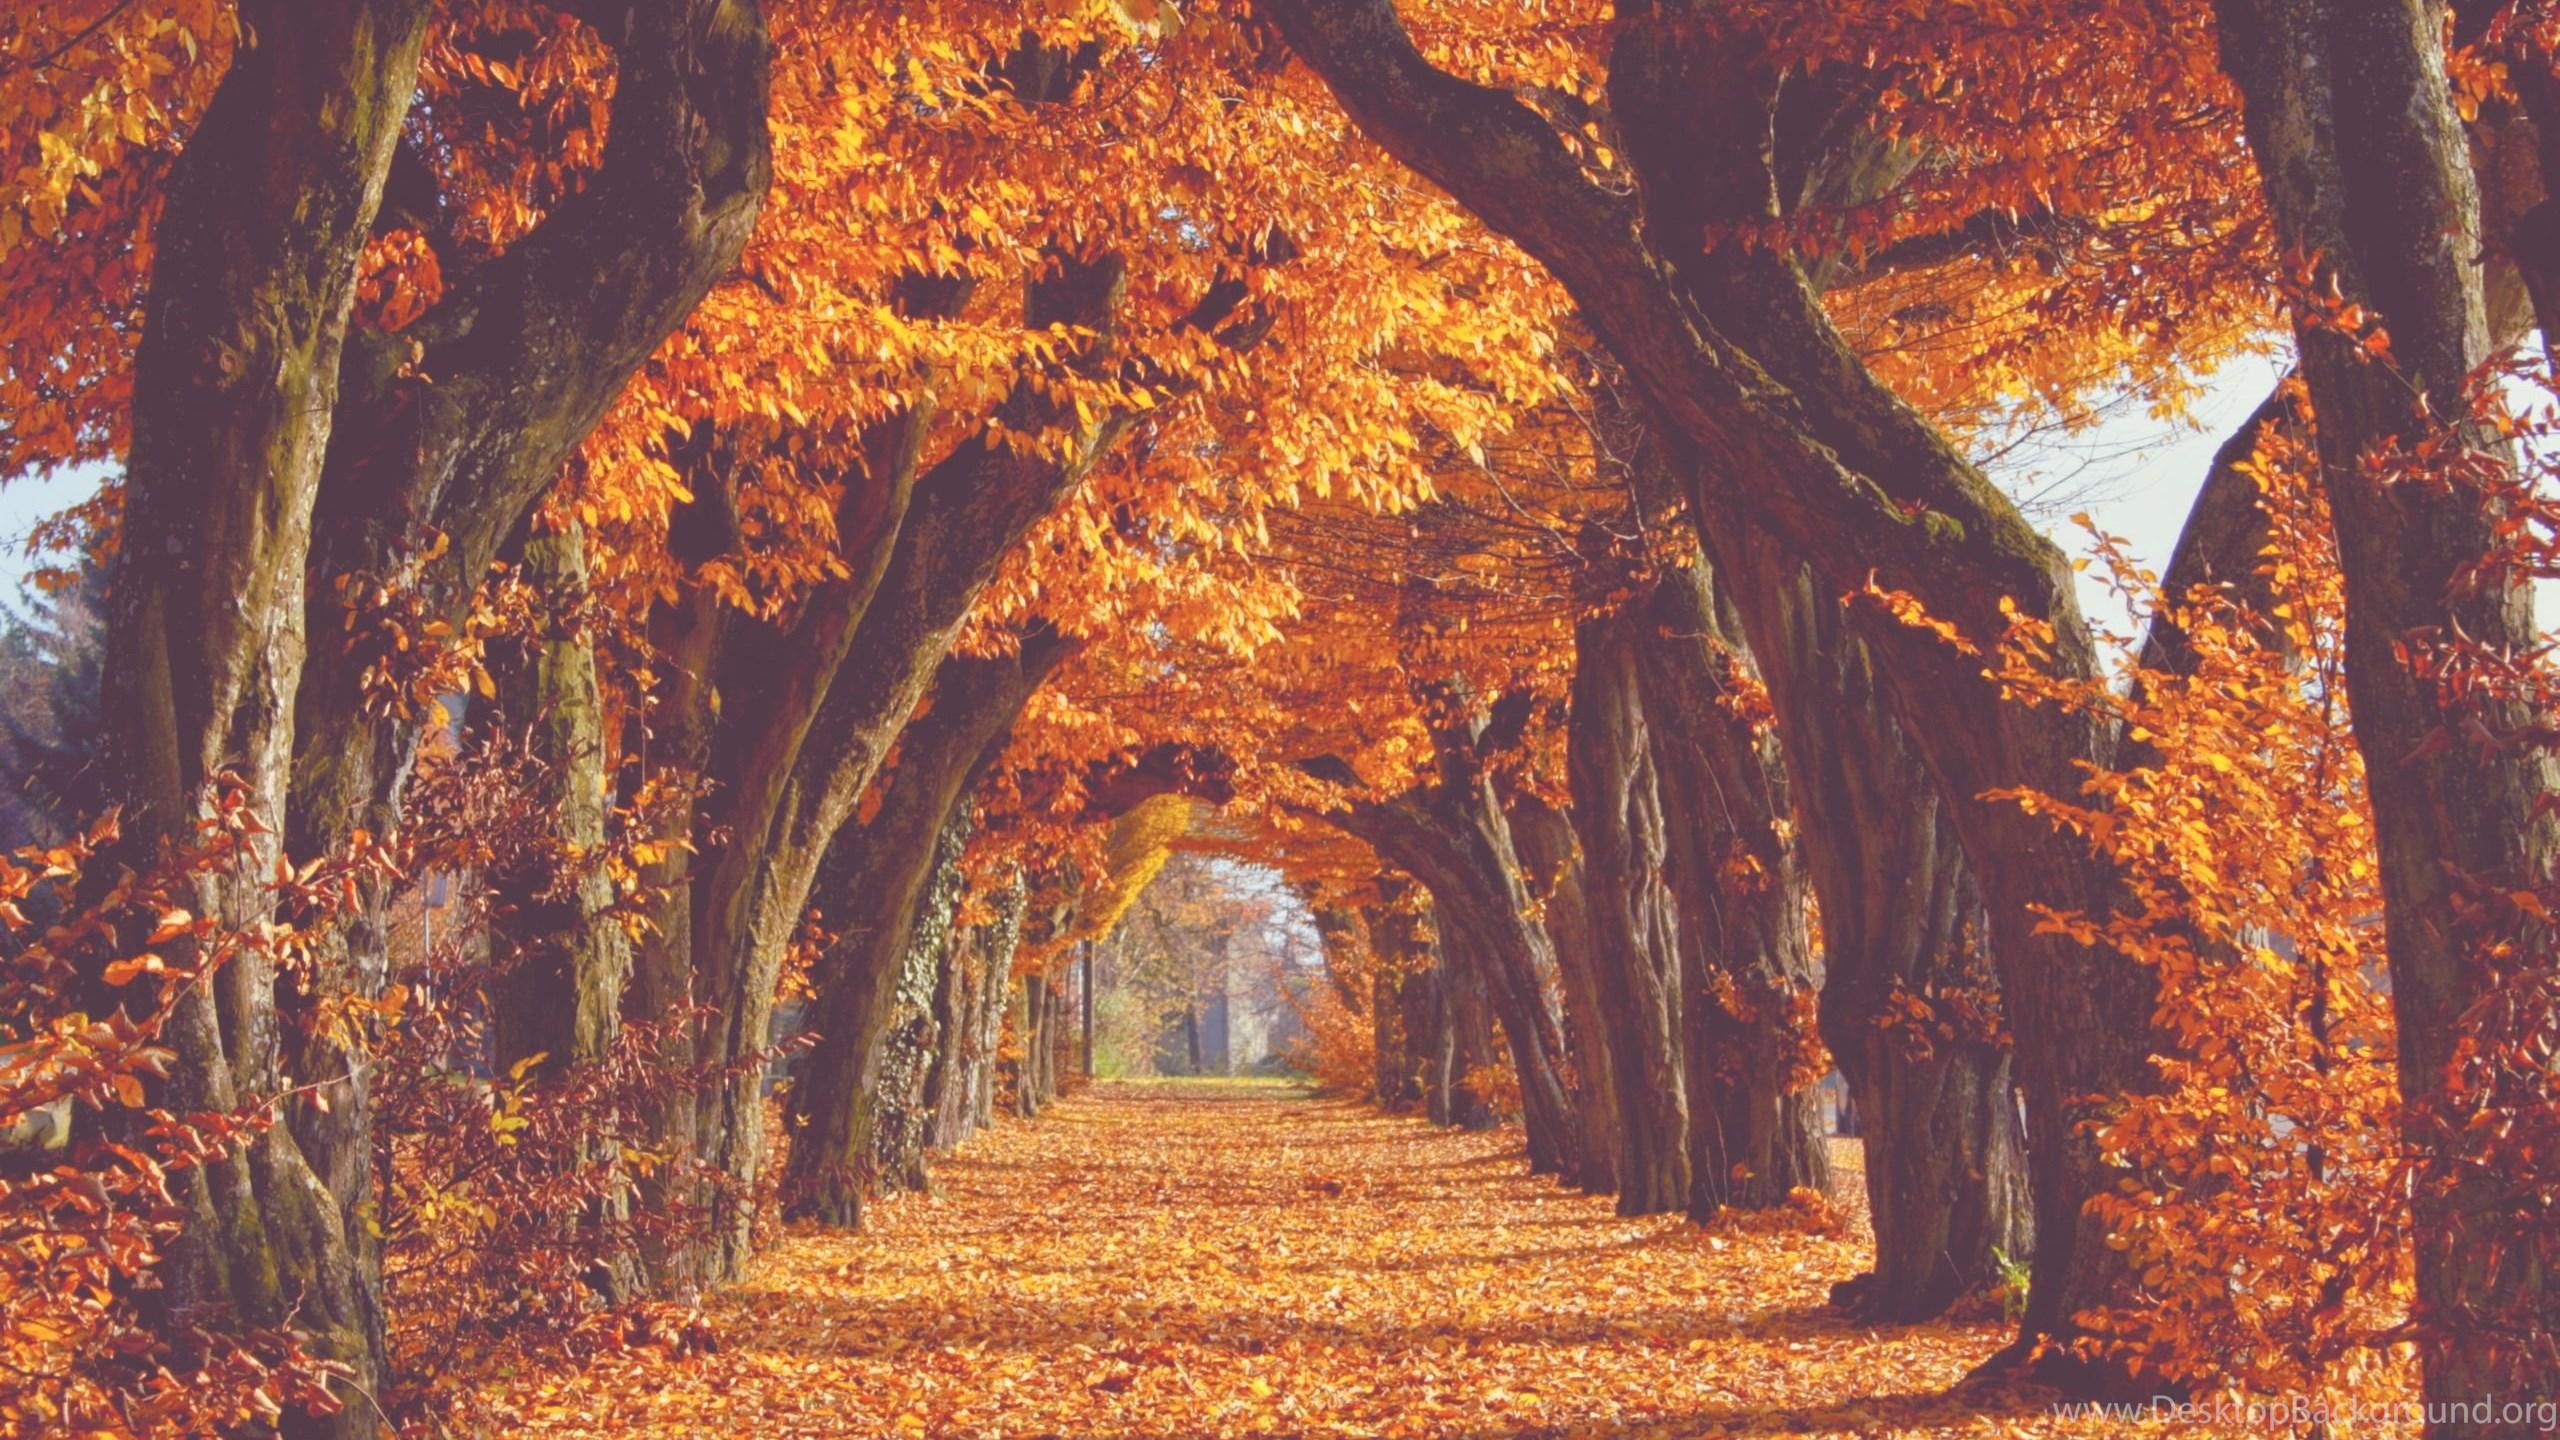 Fall Desktop Wallpaper Tumblr - Fall Background Tumblr Desktop - HD Wallpaper